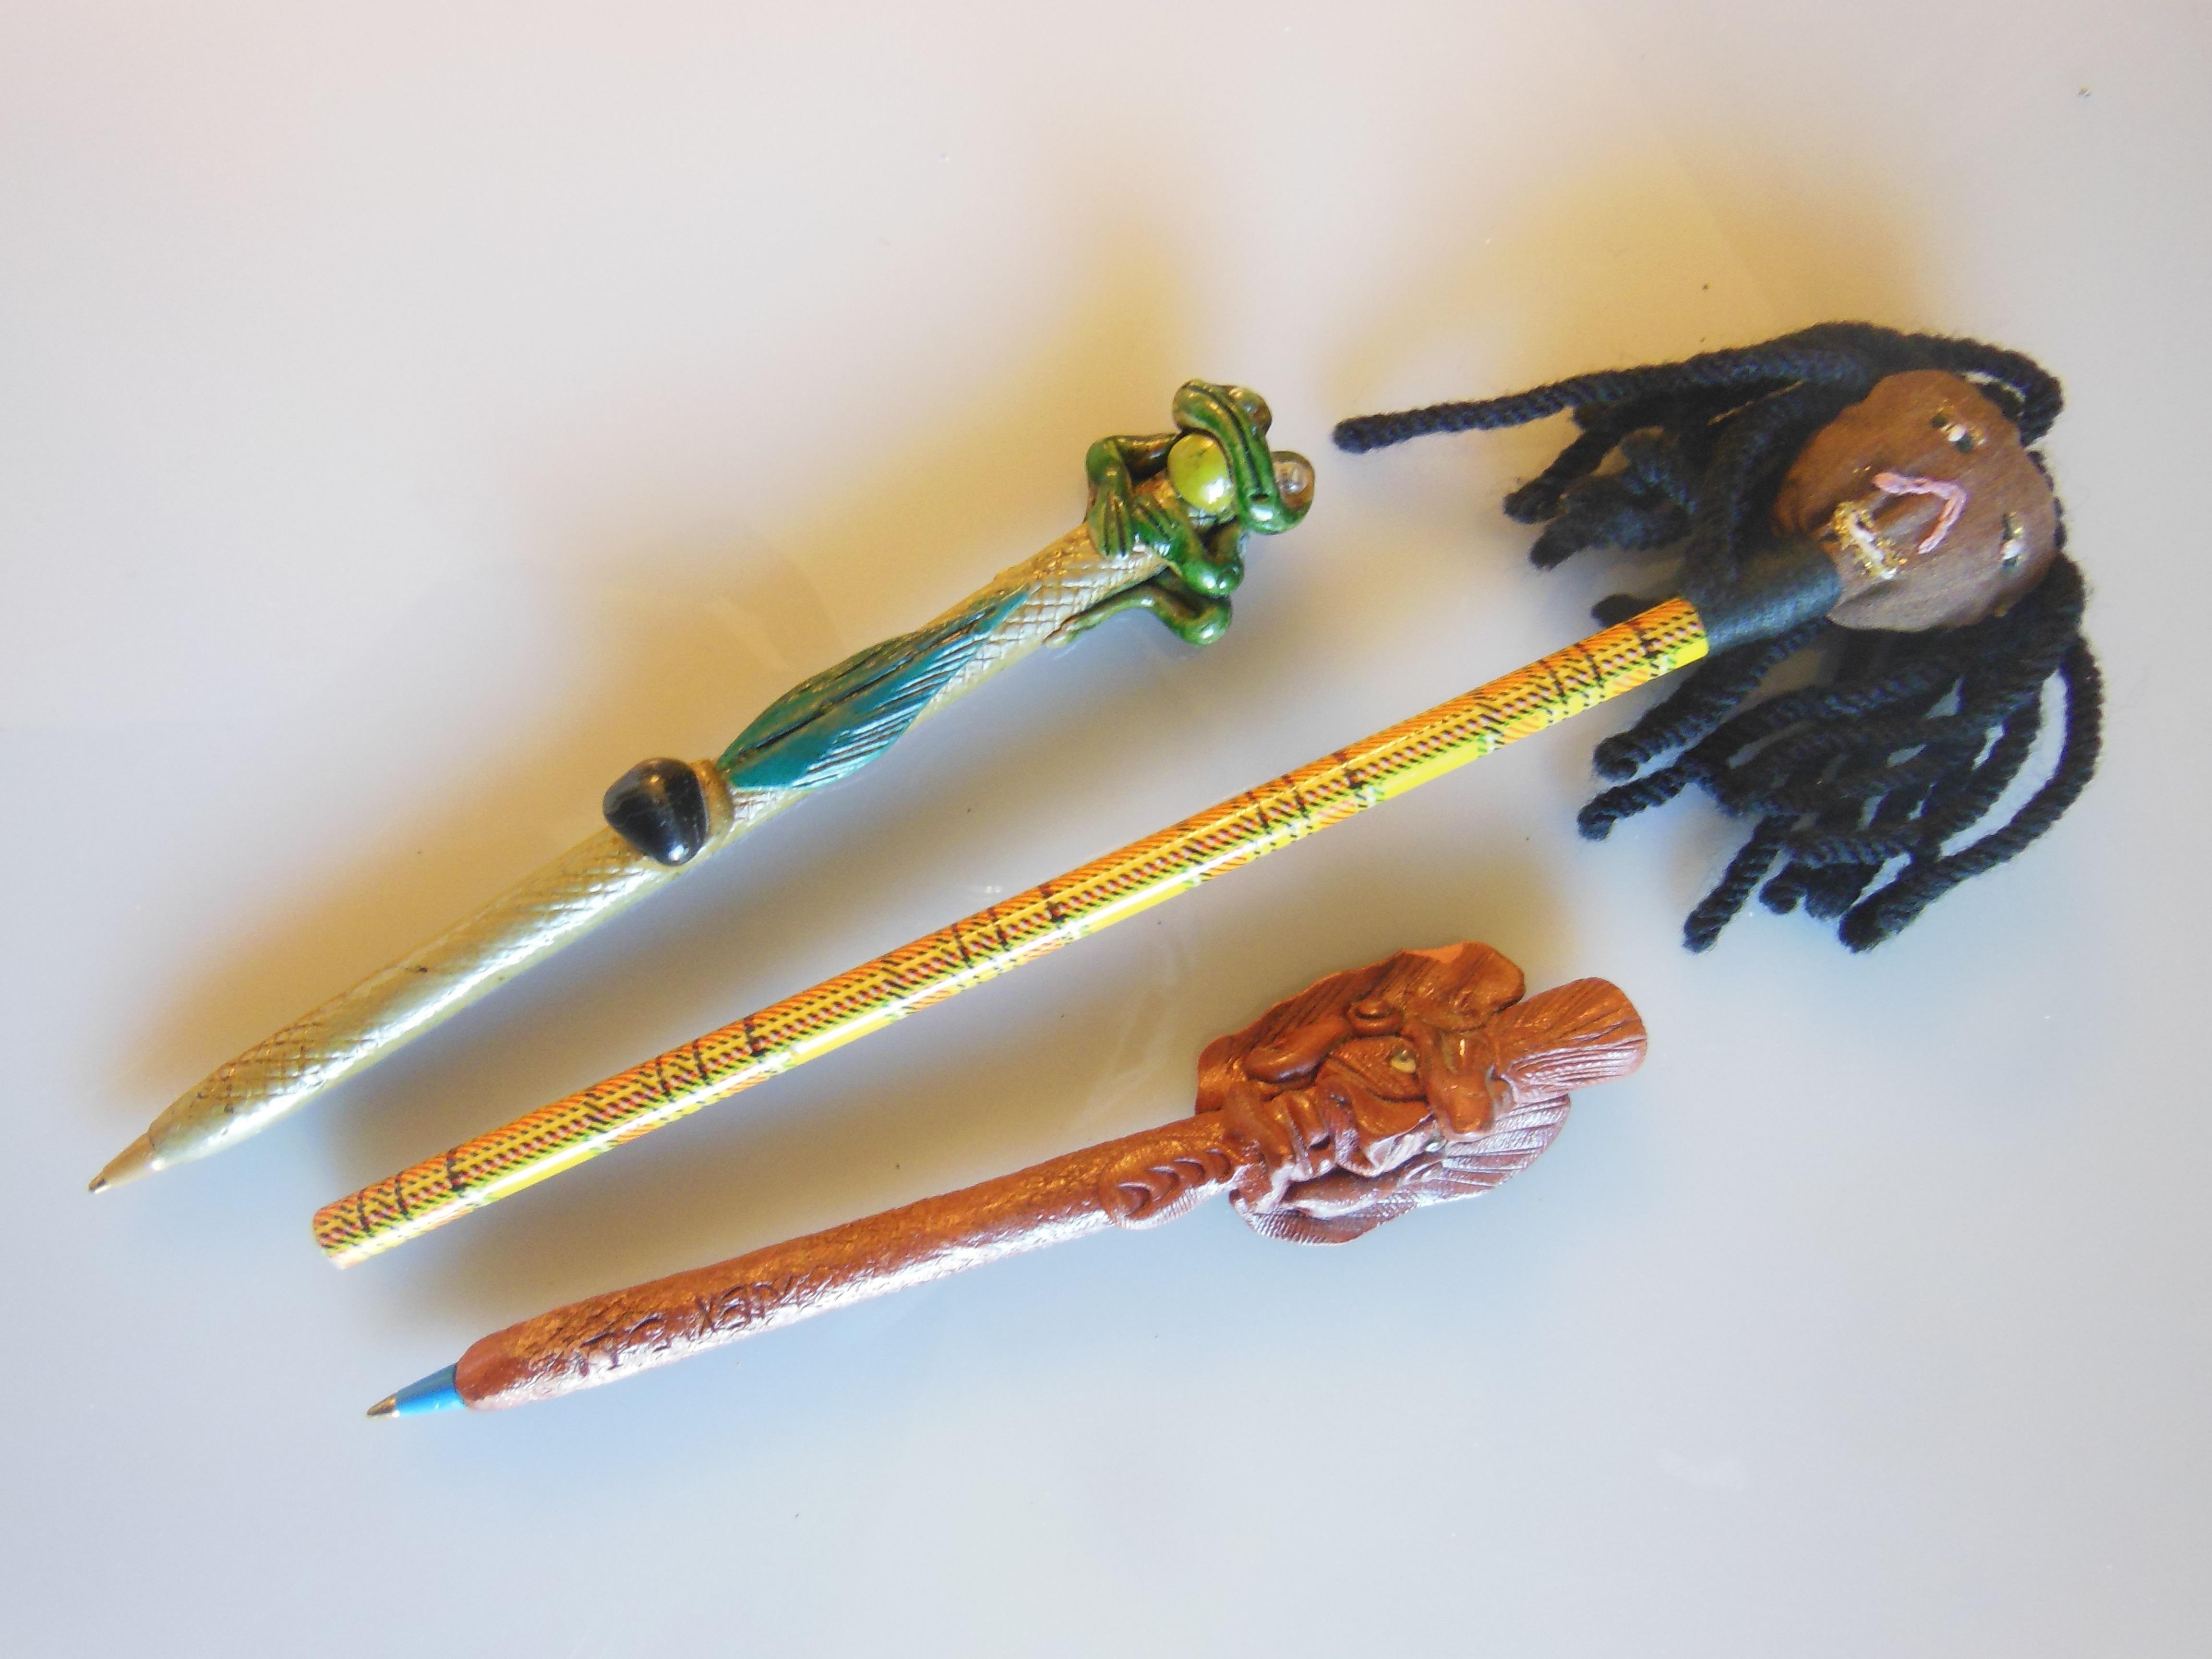 home-pens-st-lucia-all-02.jpg